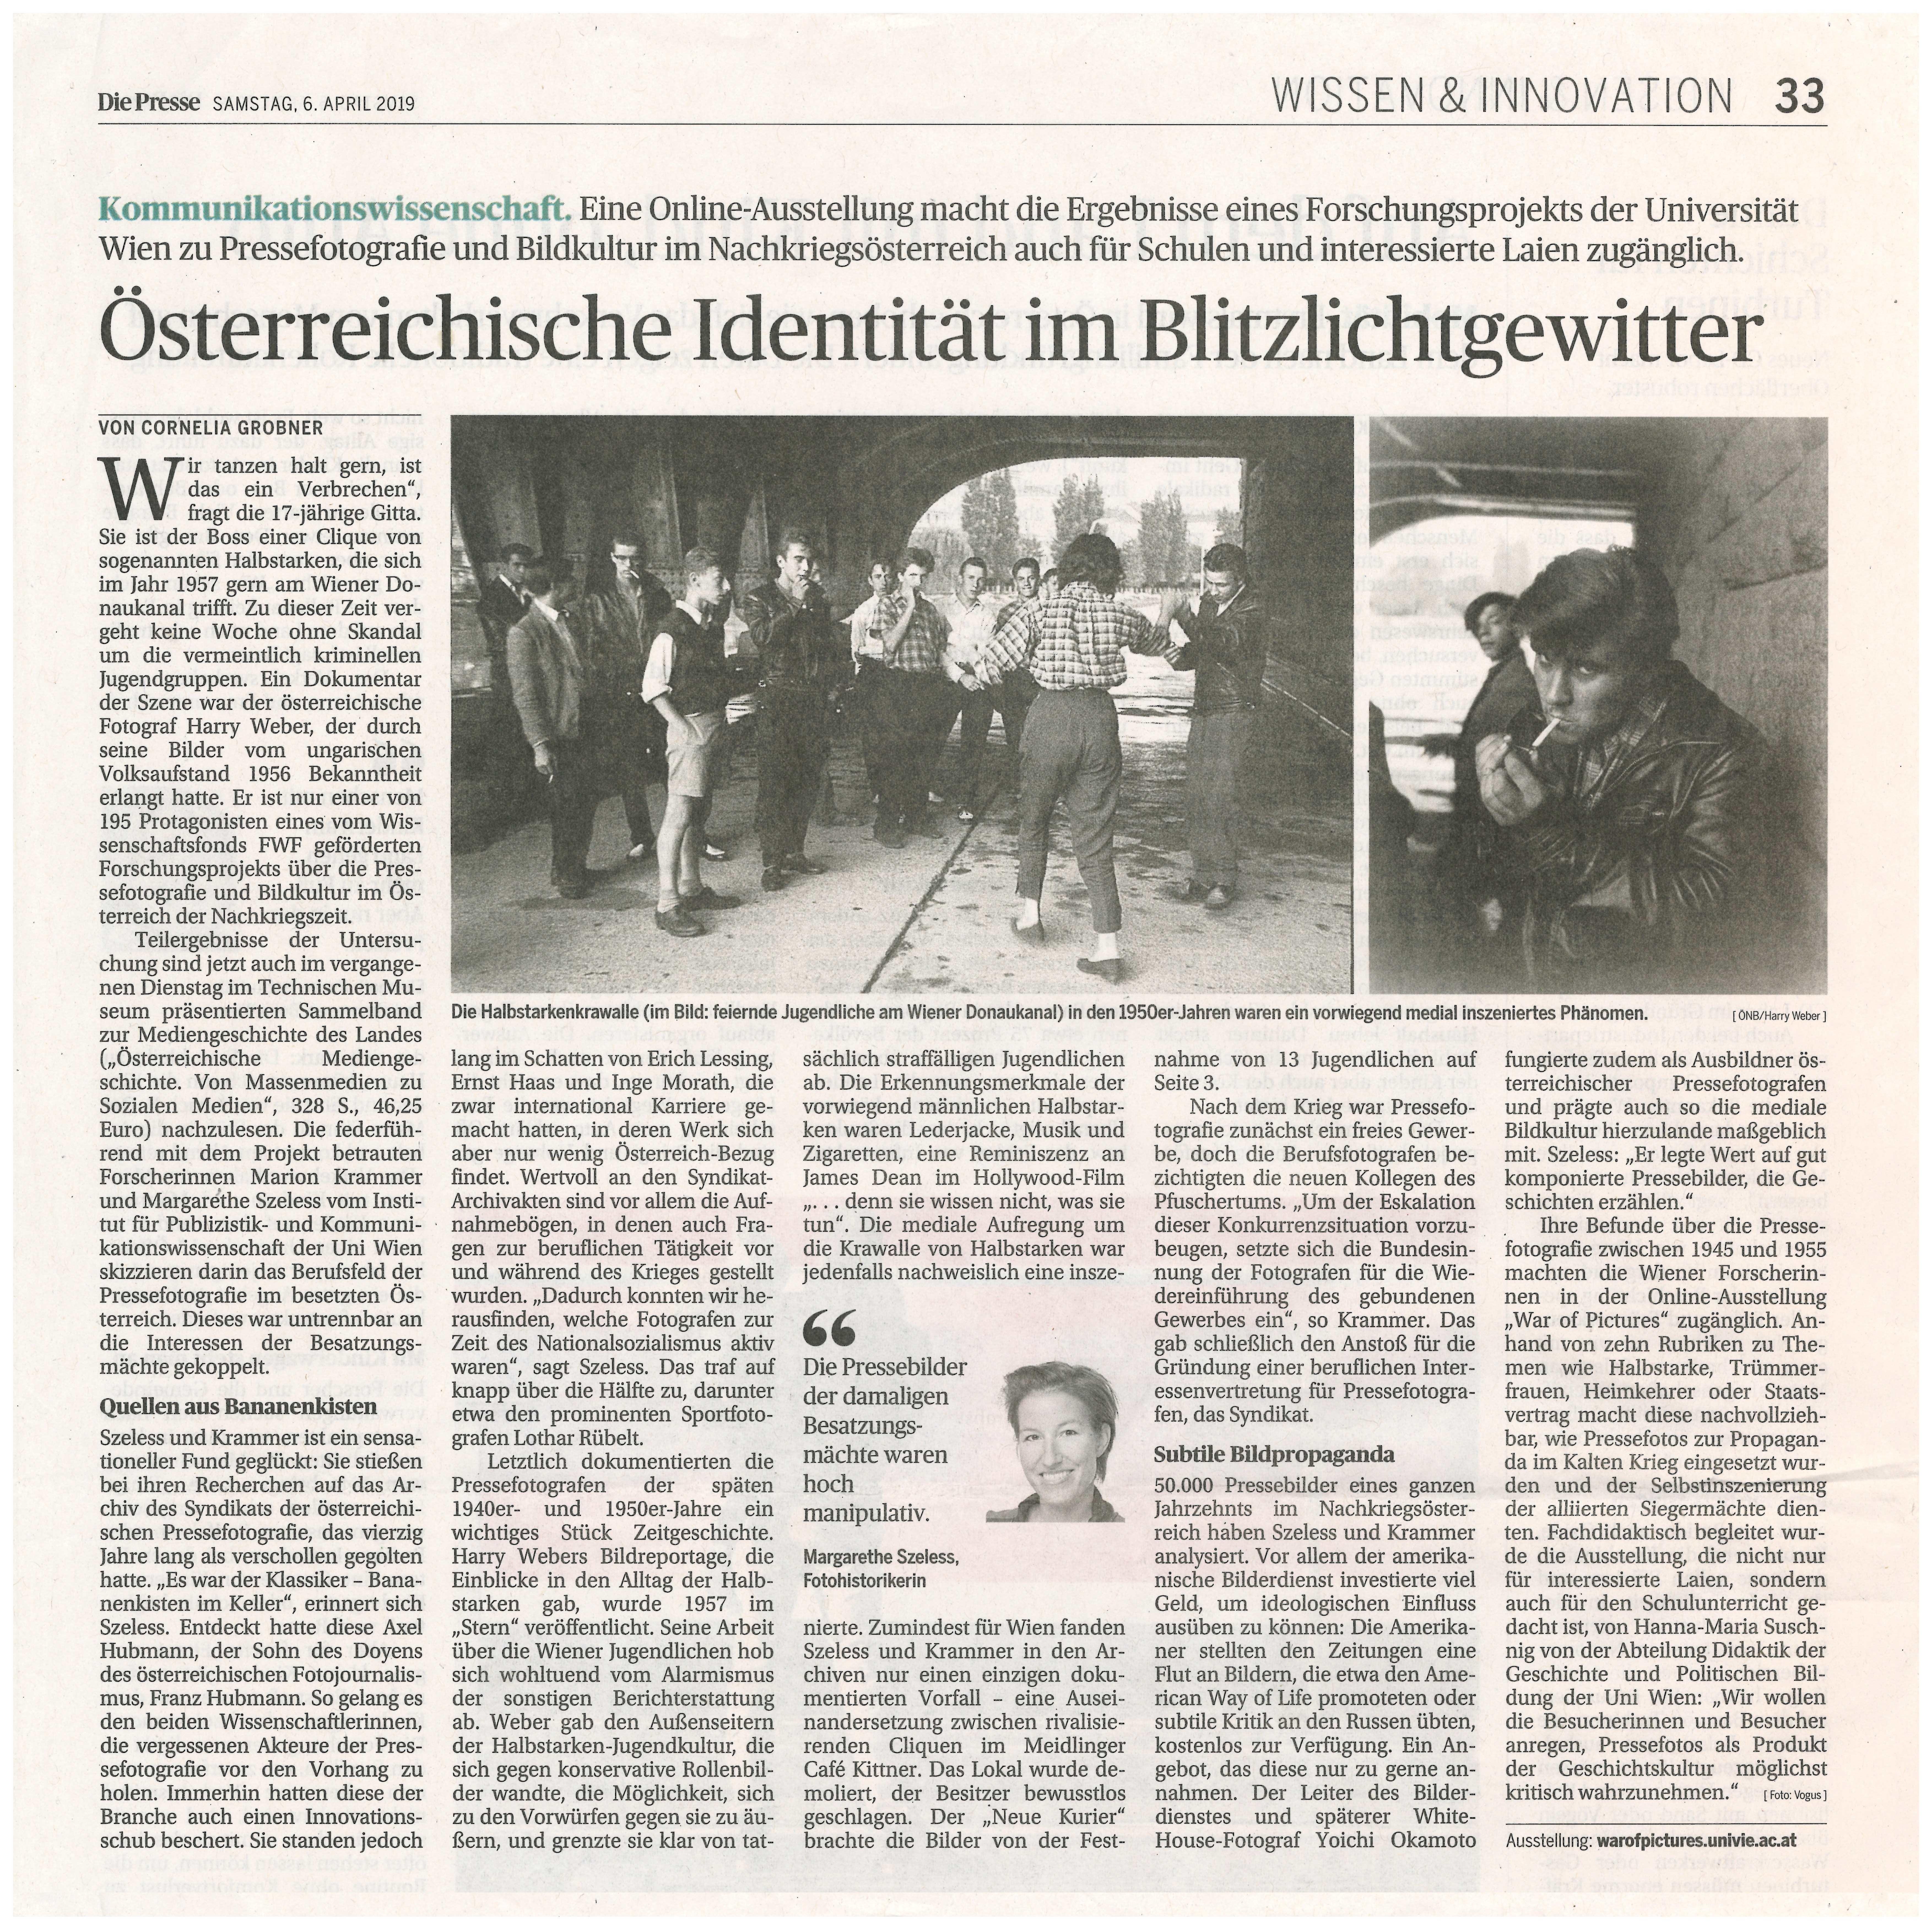 Nachkriegspropaganda Pressefotografen War of Pictures